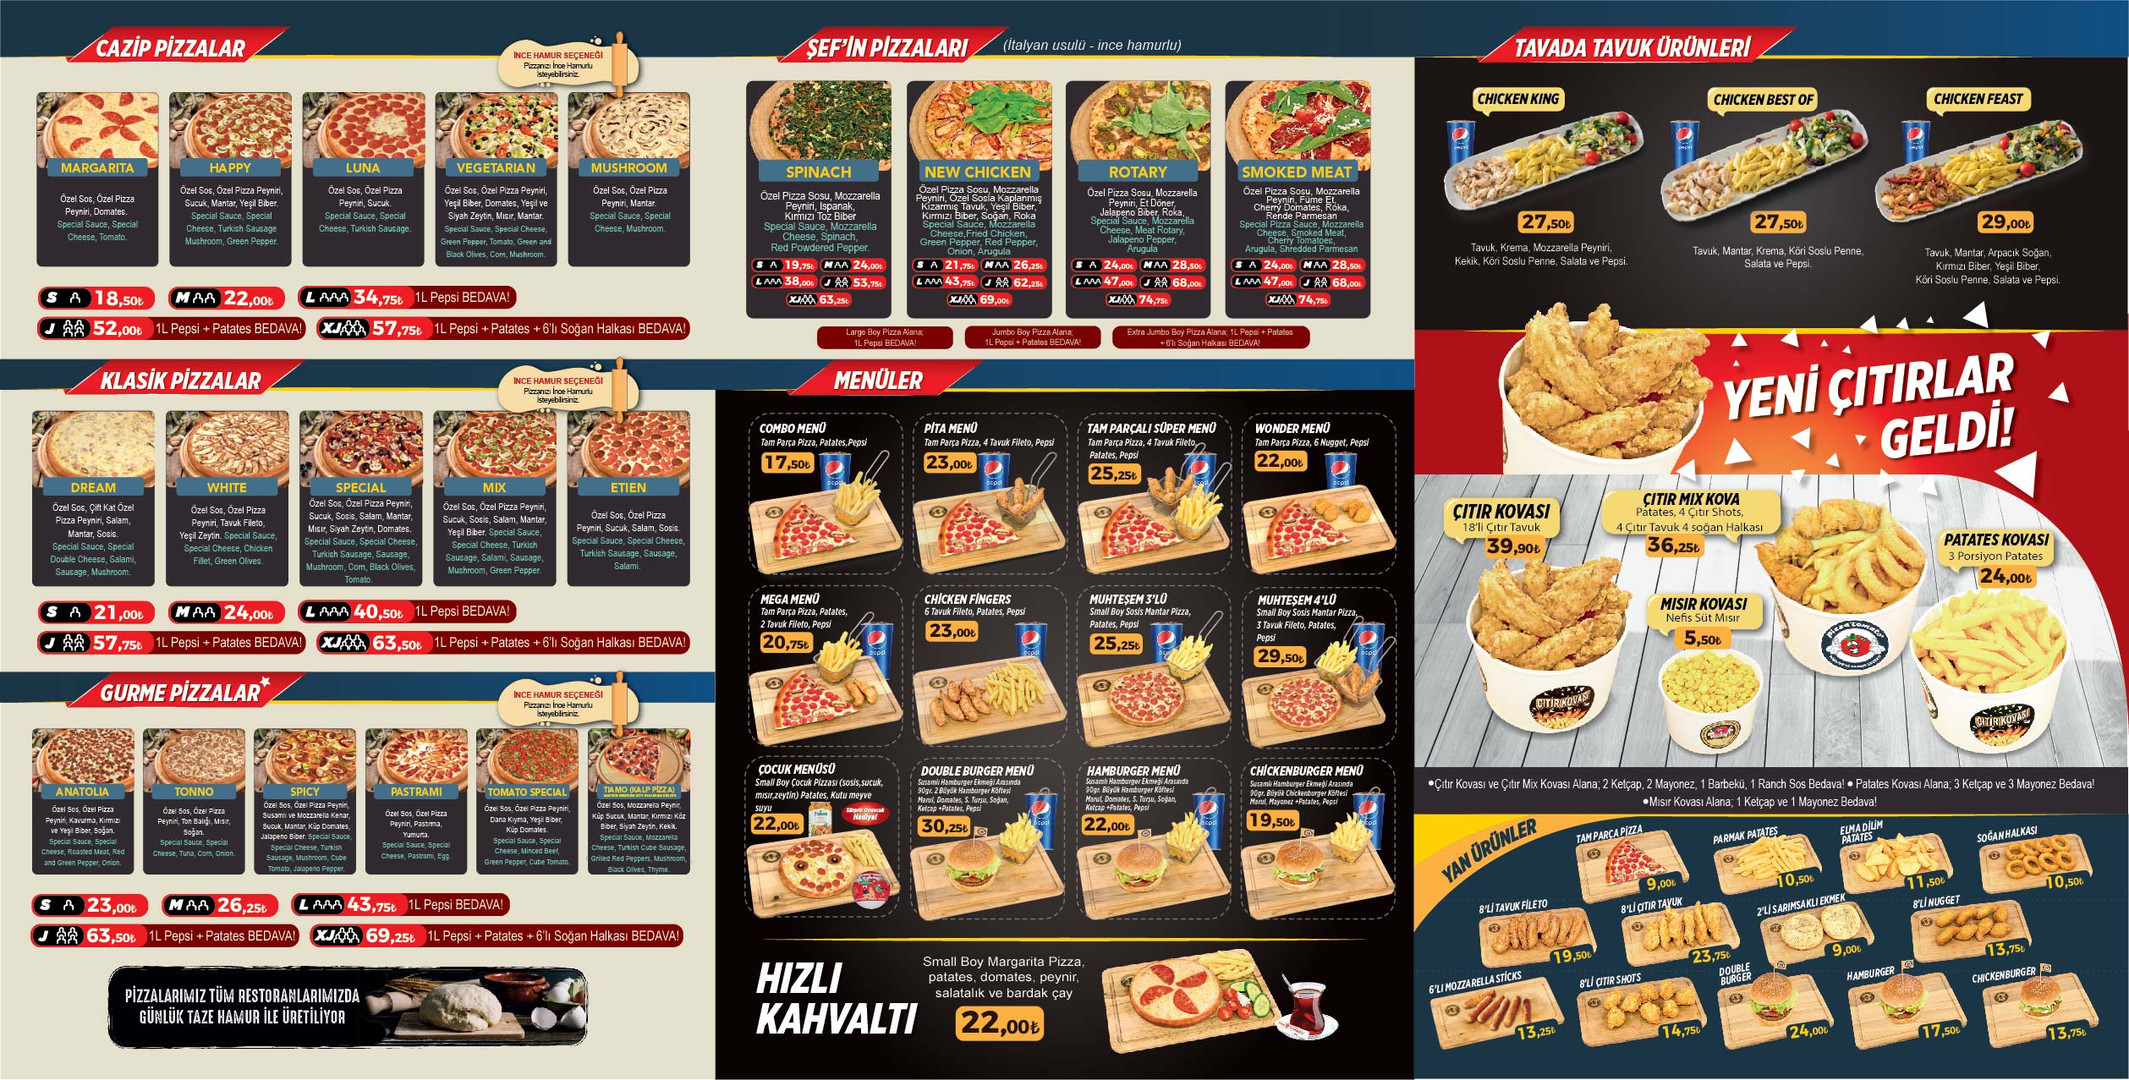 Pizza Tomato denizli merkezefendi menu a